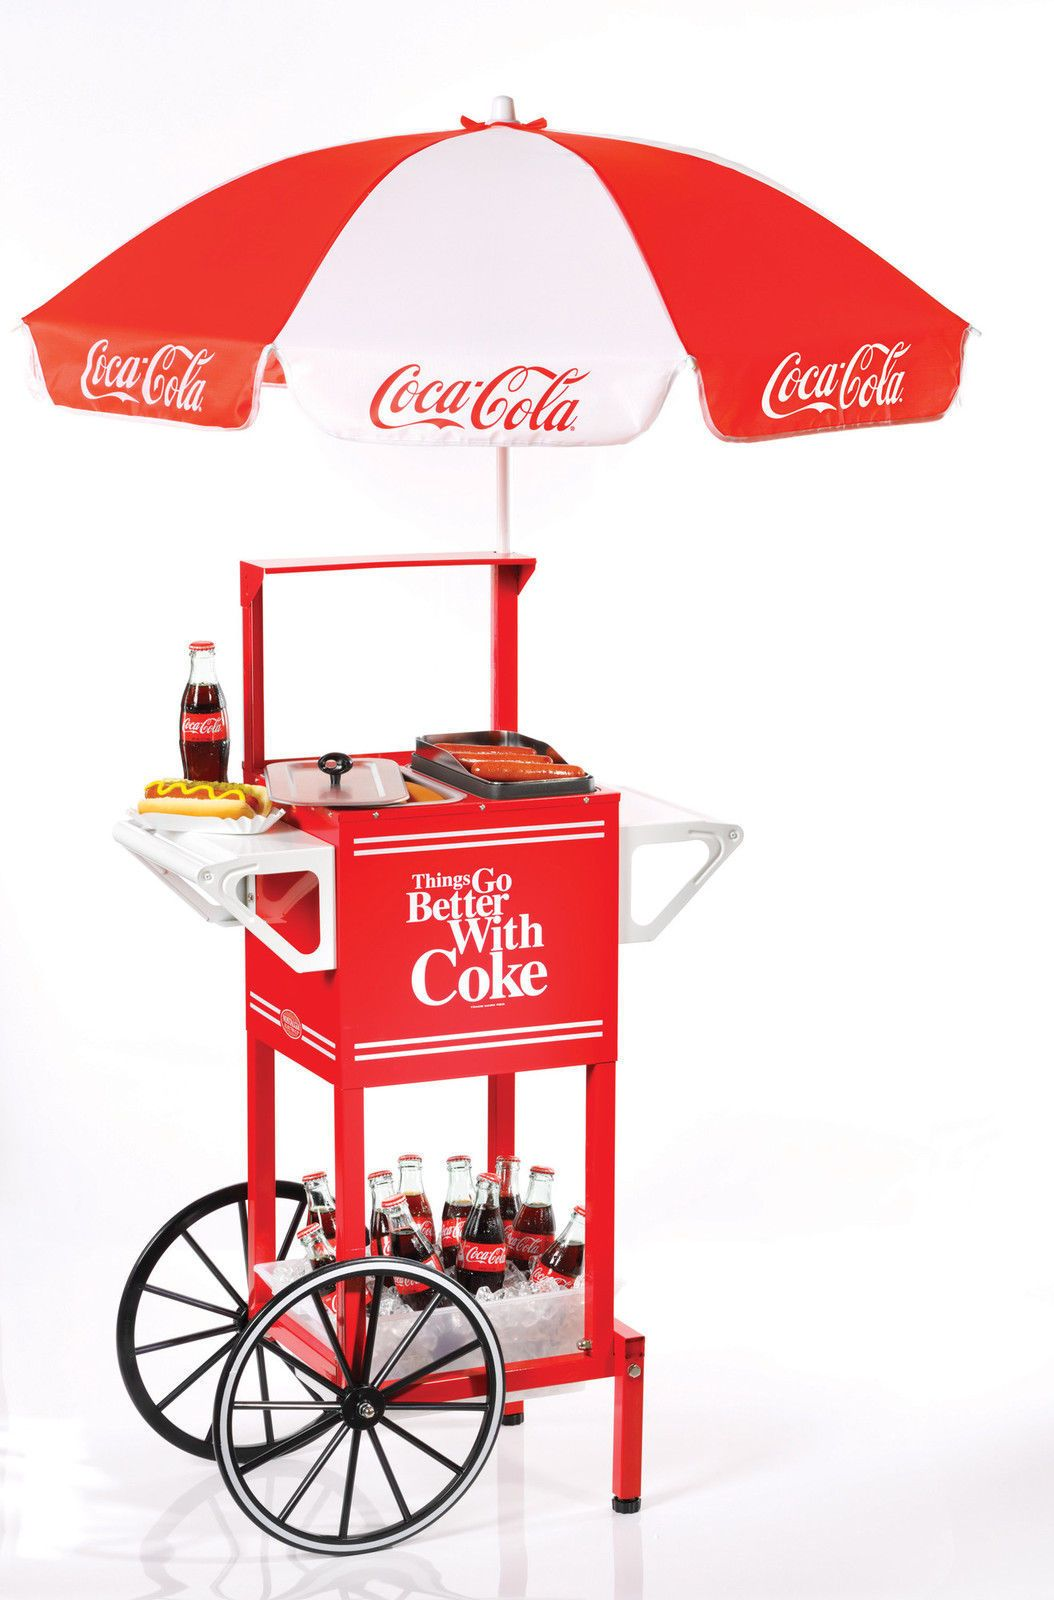 Coca Cola Hot Dog Party Umbrella Cart Nostalgia Coke Soda Drinks